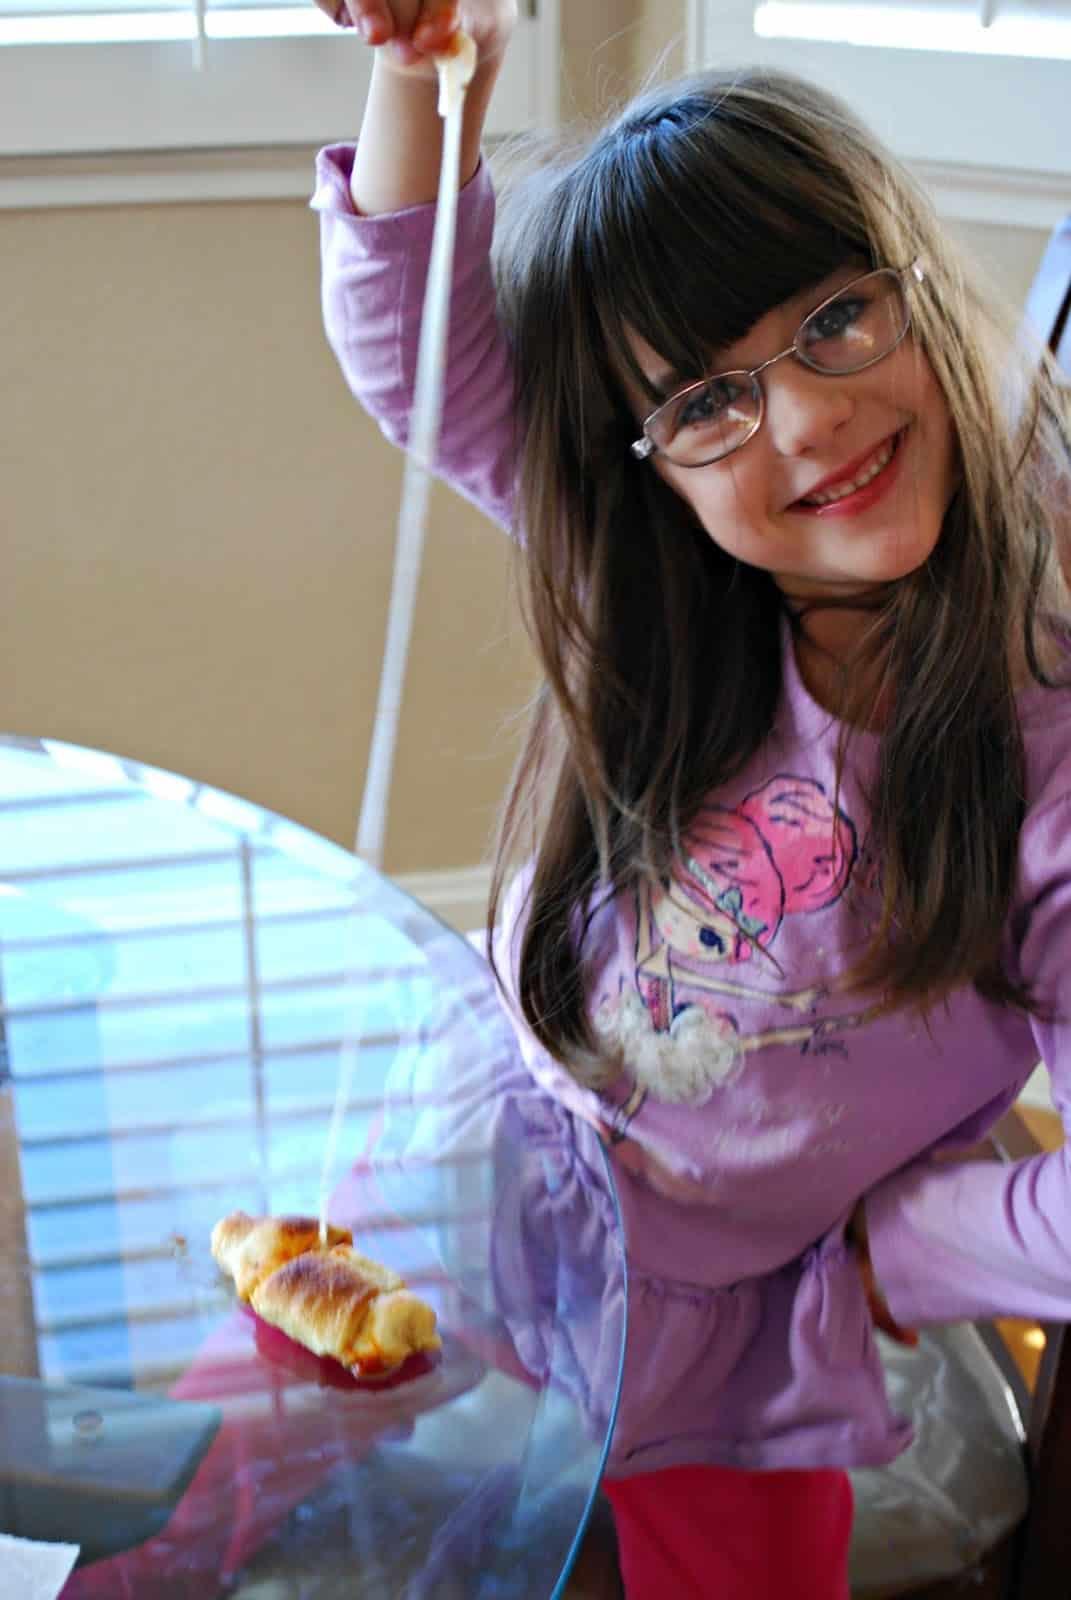 kids love crescent roll recipes